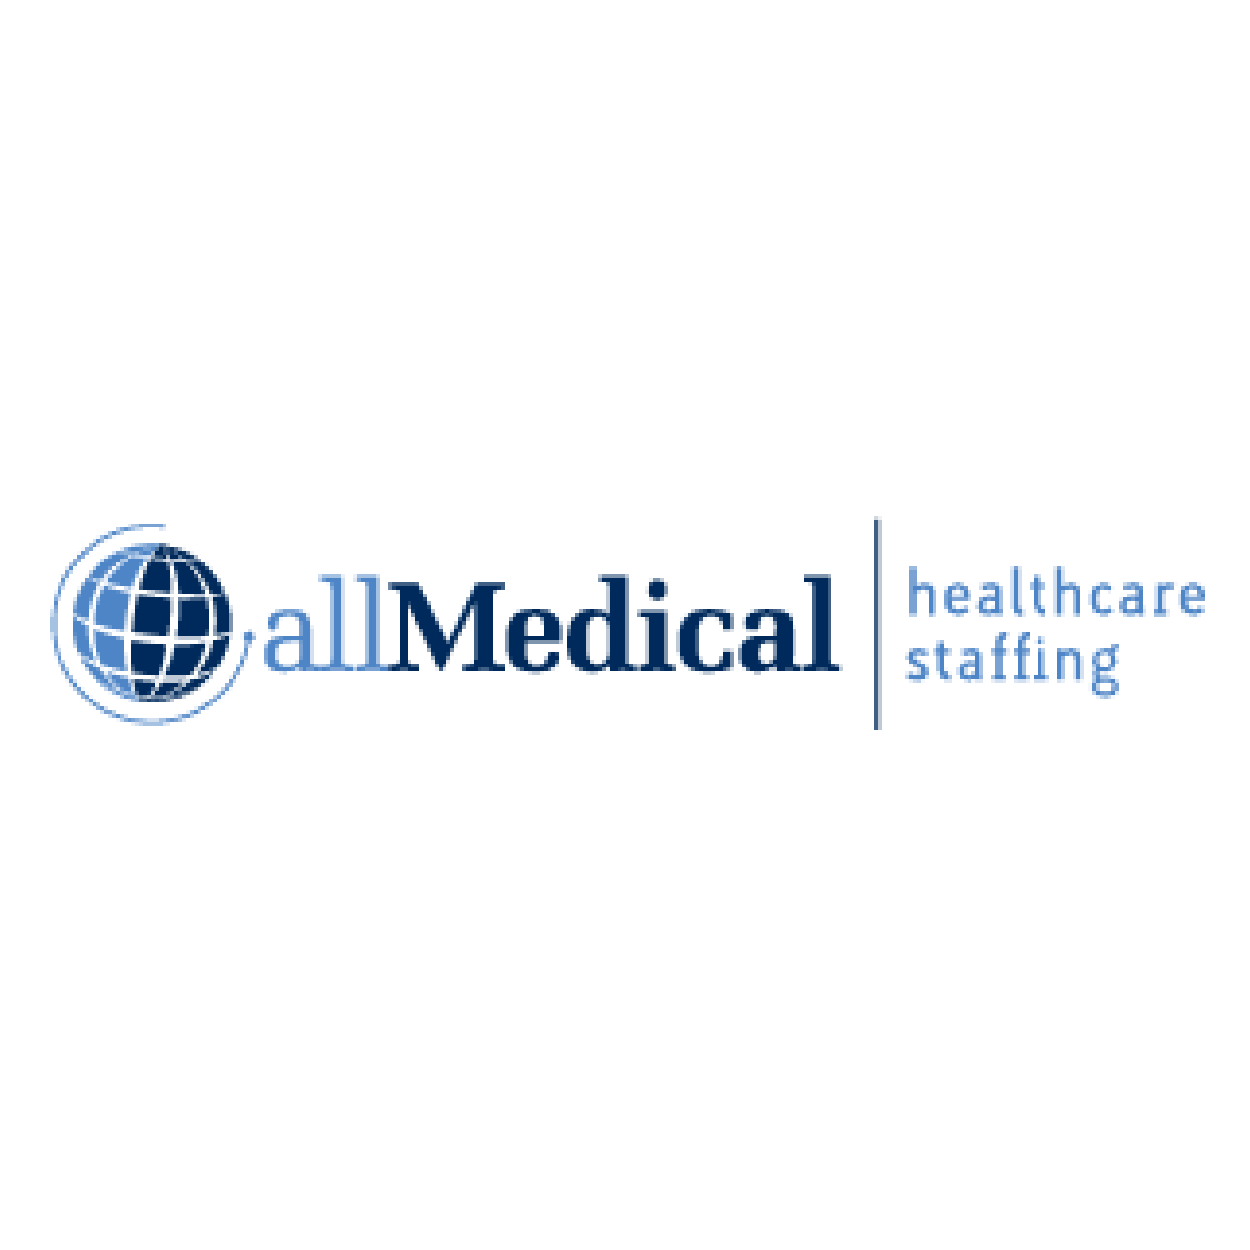 allmedical